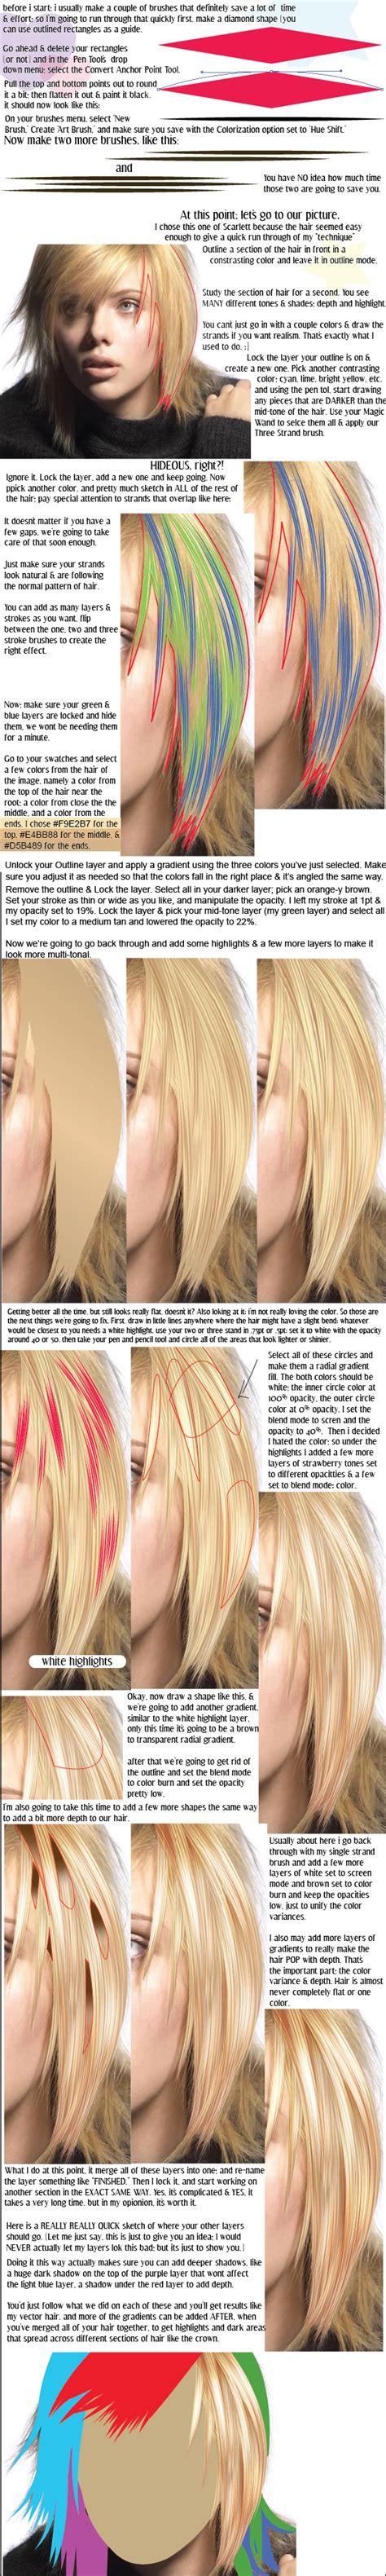 tutorial vector hair vector hair tutorial by smashbabyy on deviantart